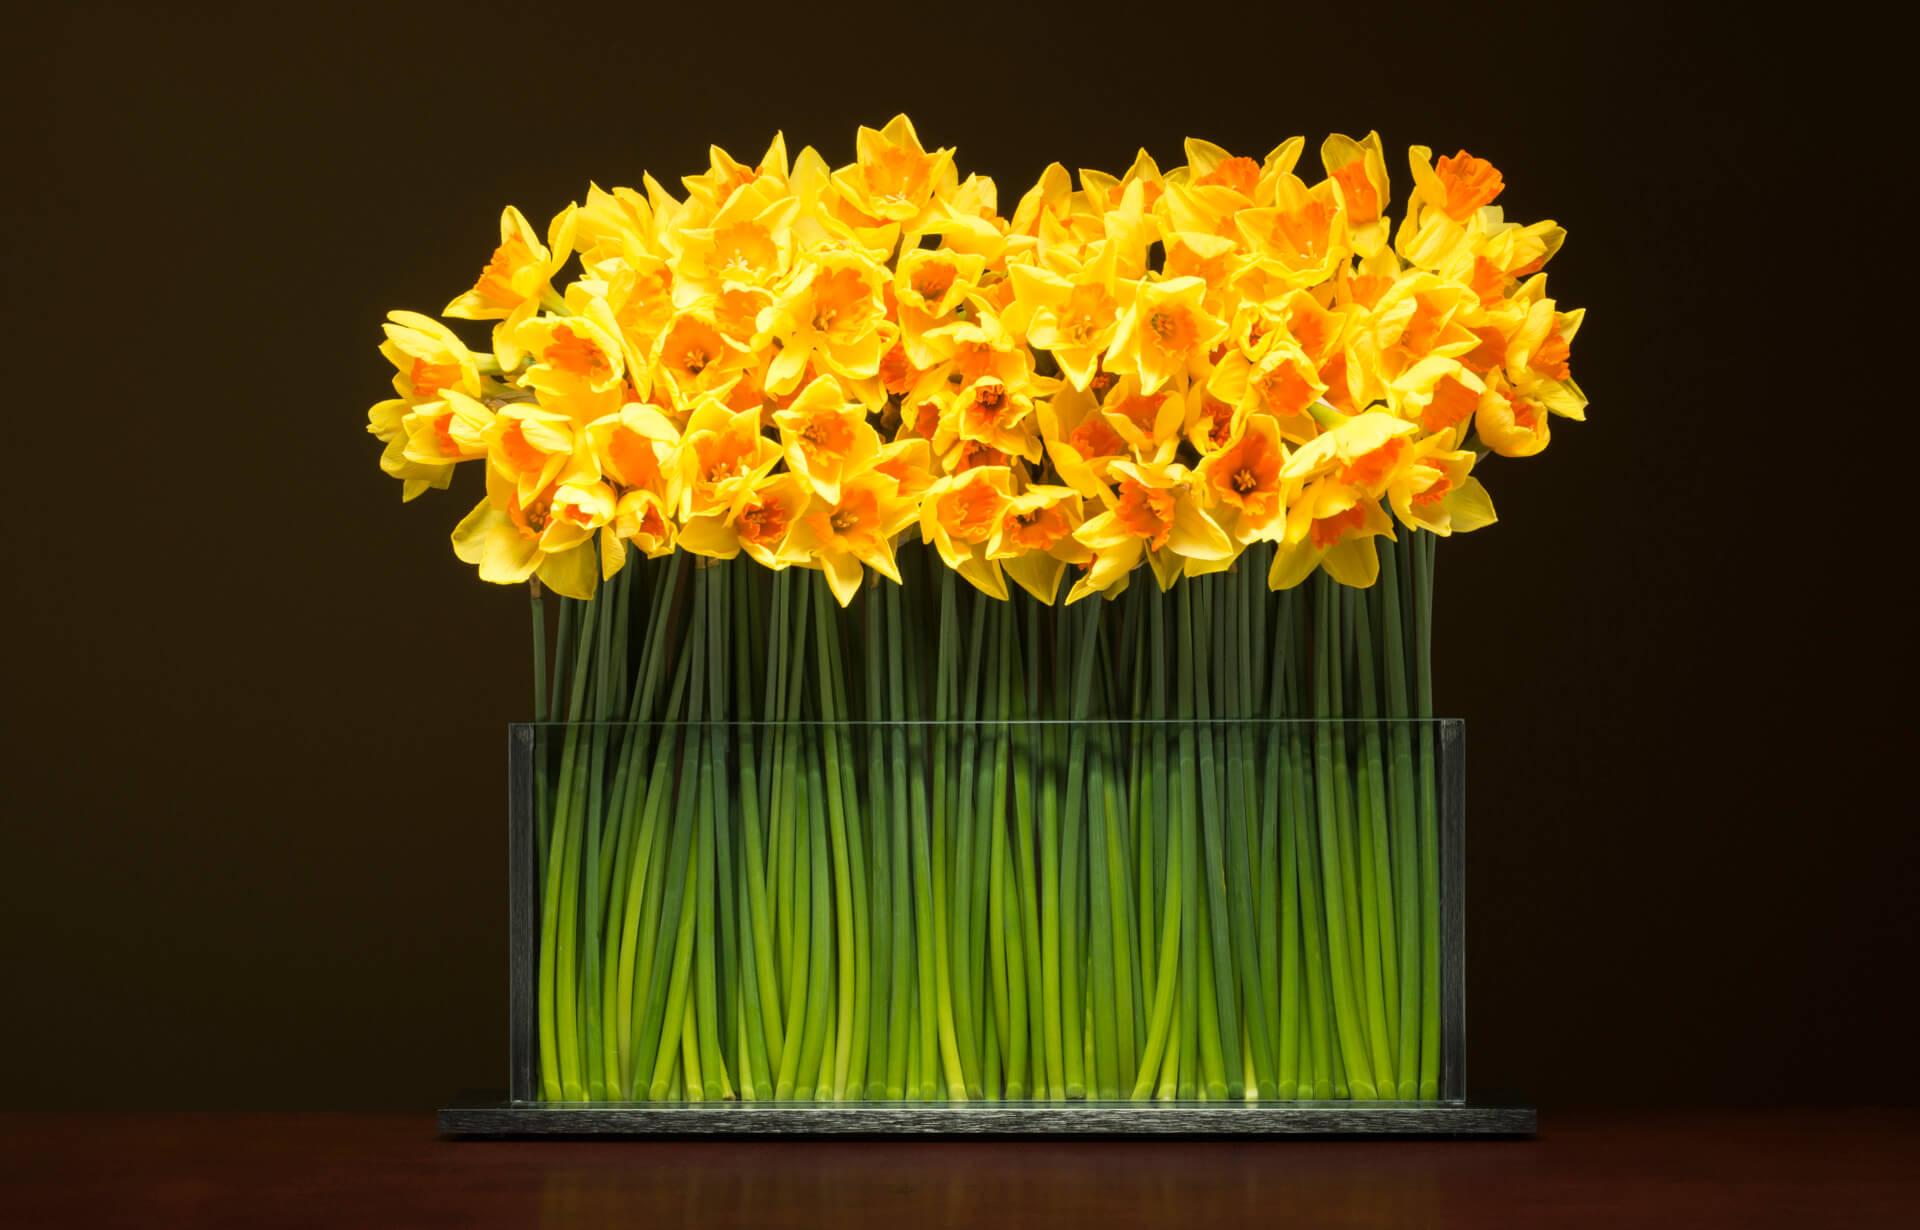 Stems Vases by Stephen White